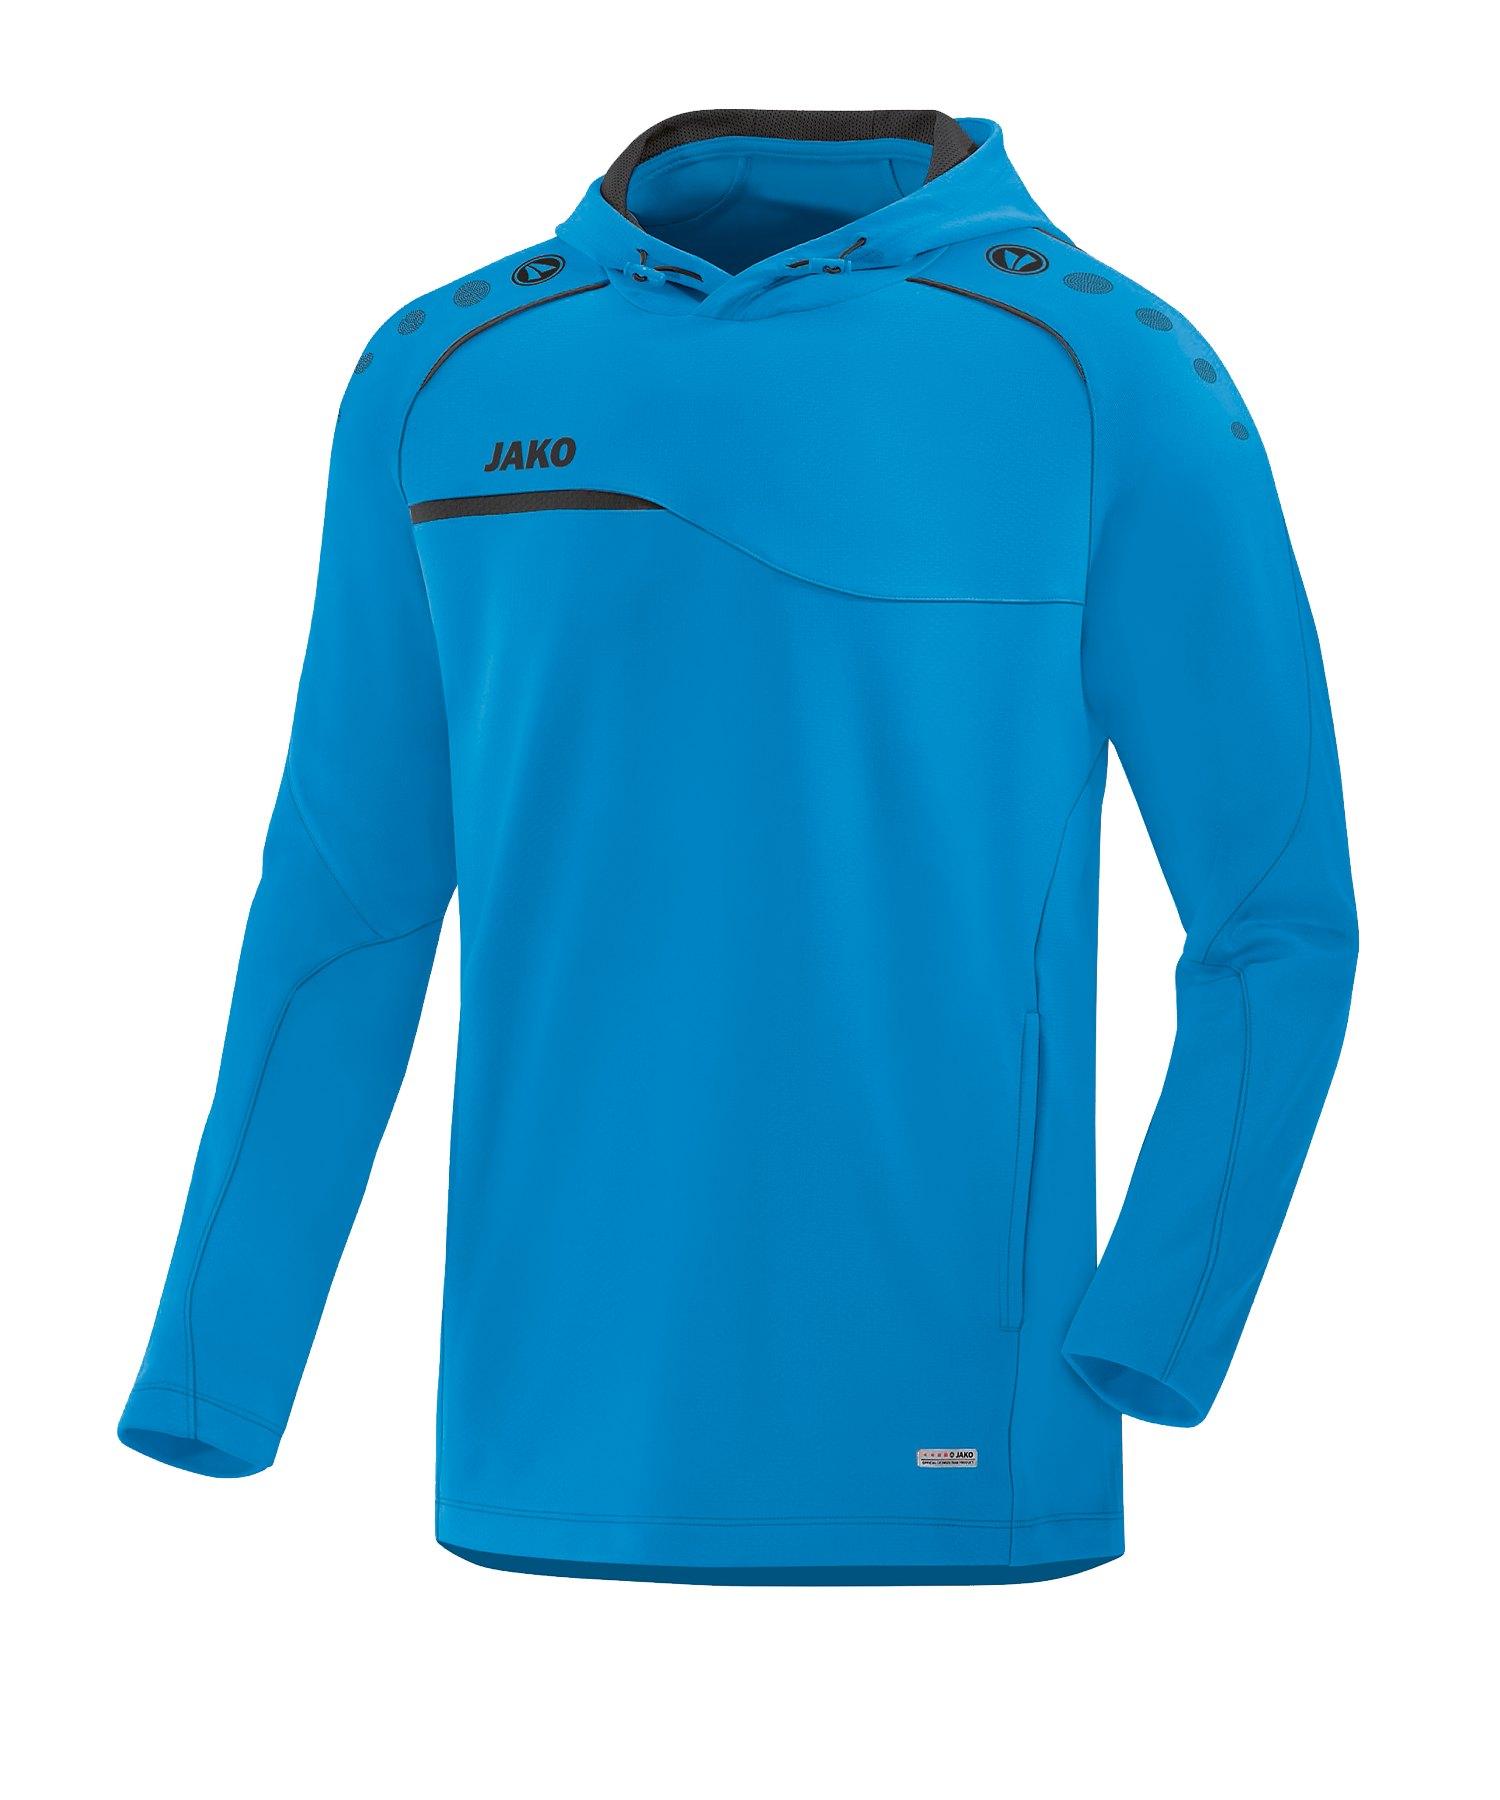 Jako Prestige Kapuzensweatshirt Kids Blau F21 - blau